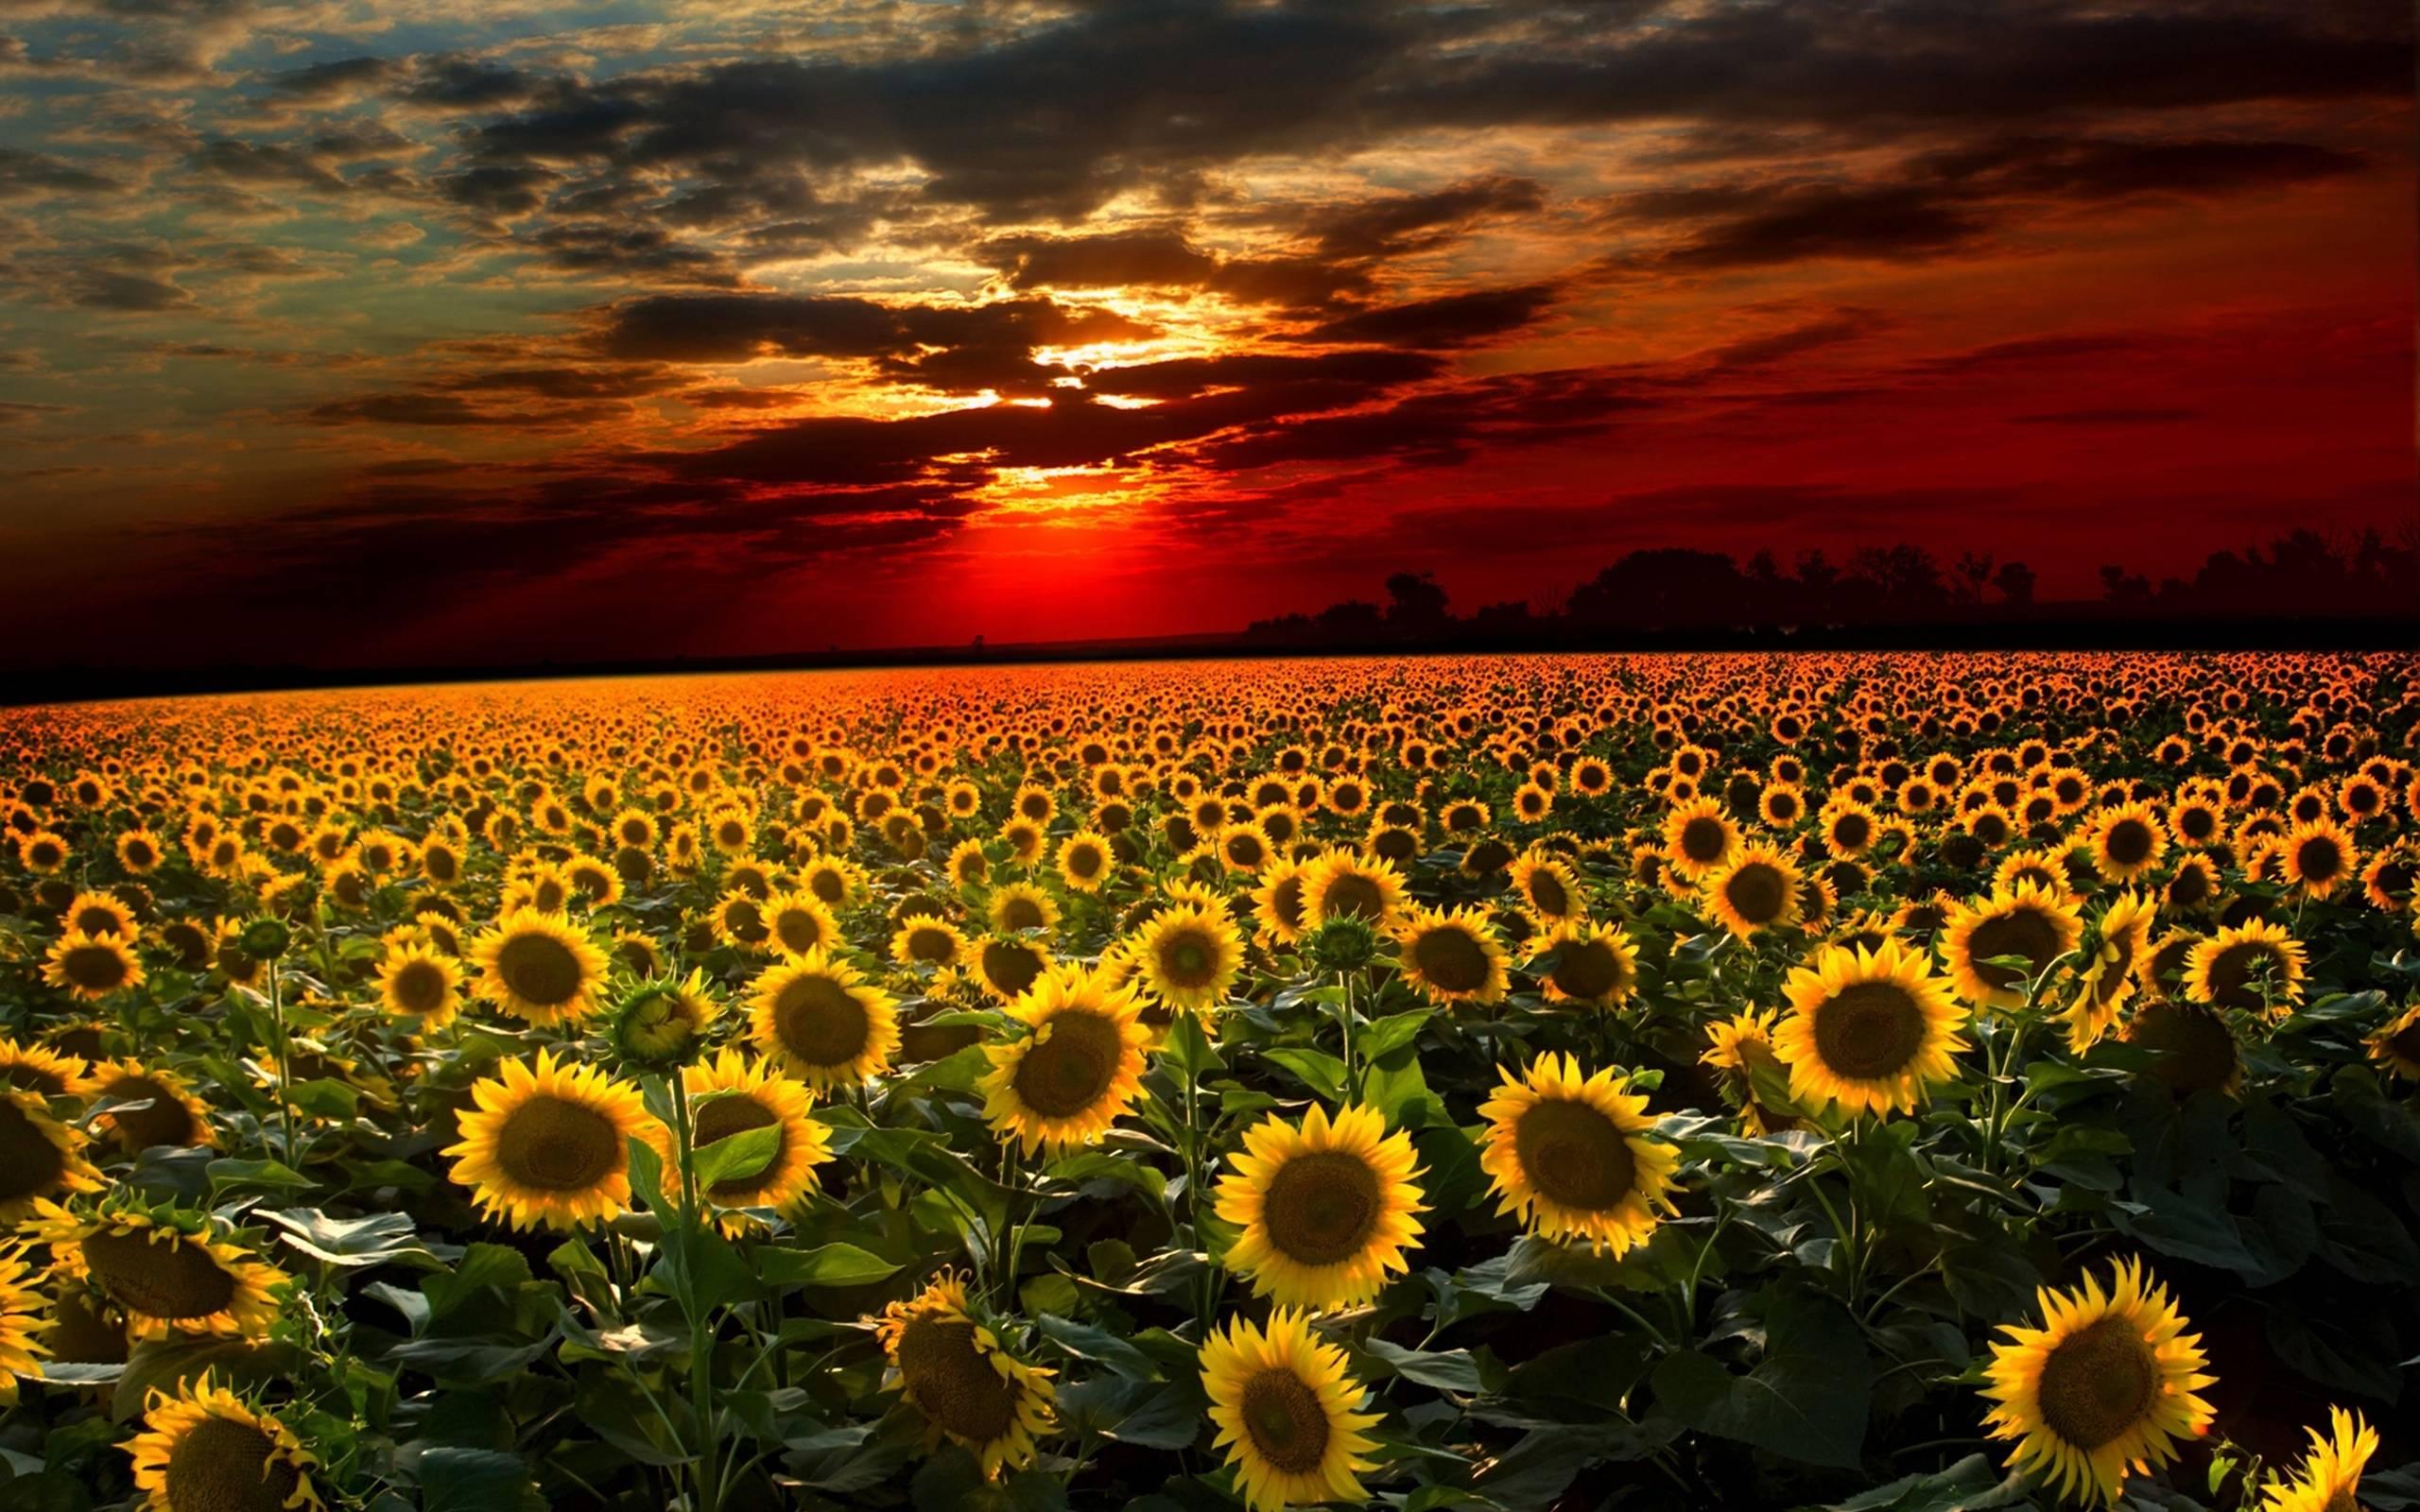 sunflower computer wallpapers desktop backgrounds 2560x1600 id